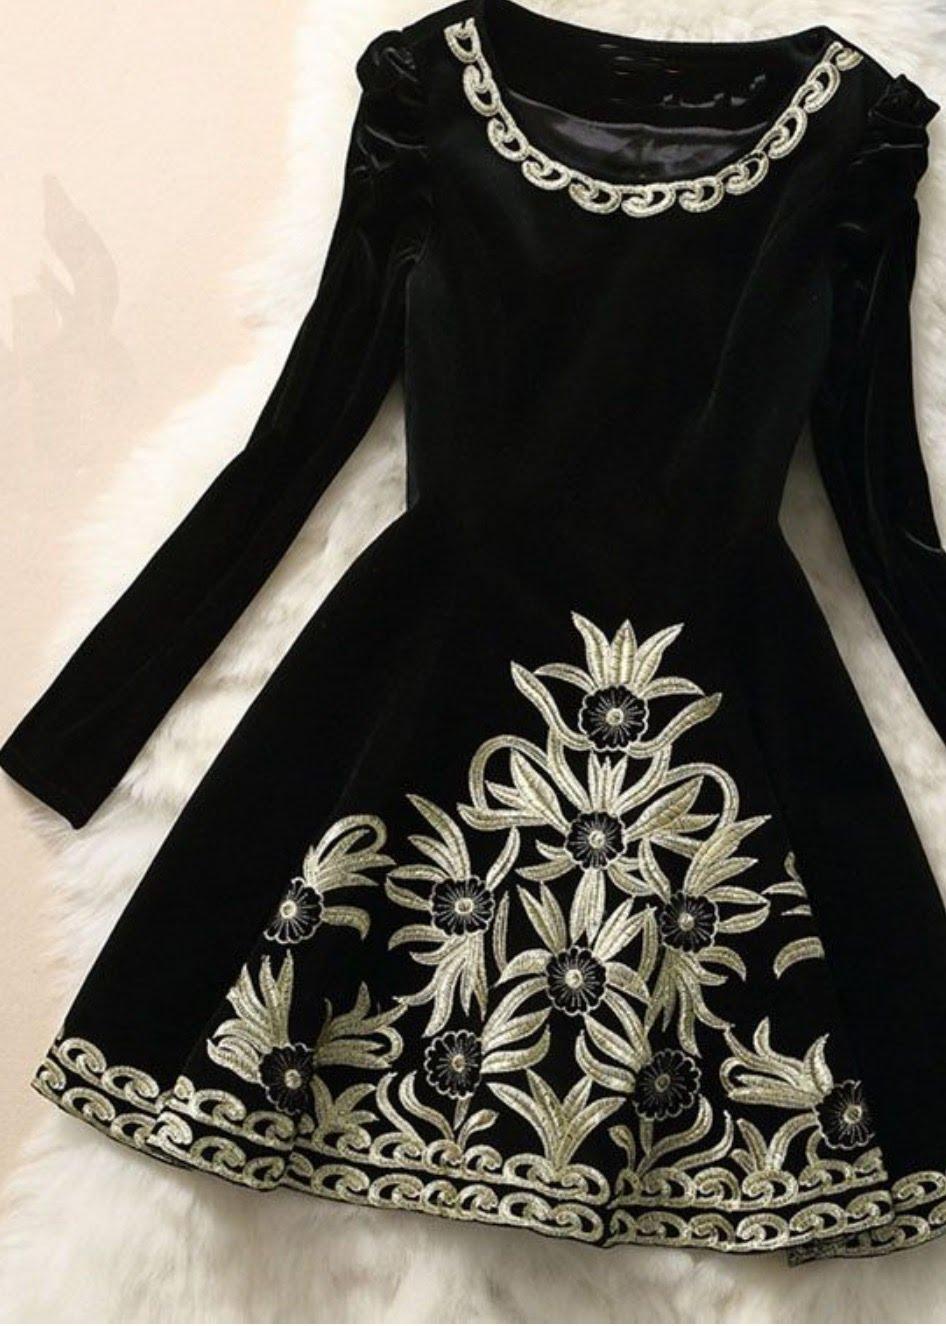 بالصور فساتين اطفال قطيفه , اجمل فستان قطيفه اطفال 1253 3